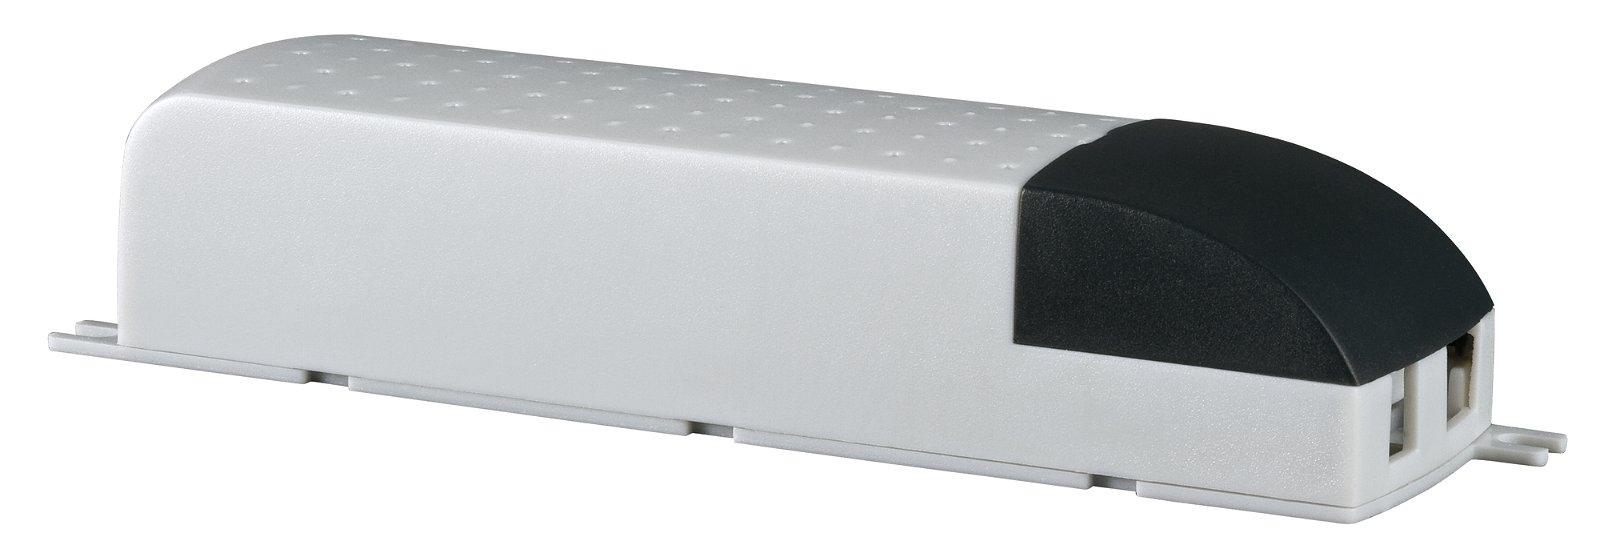 VDE Elektroniktrafo Mipro 230/12V 105VA Grau/Schwarz